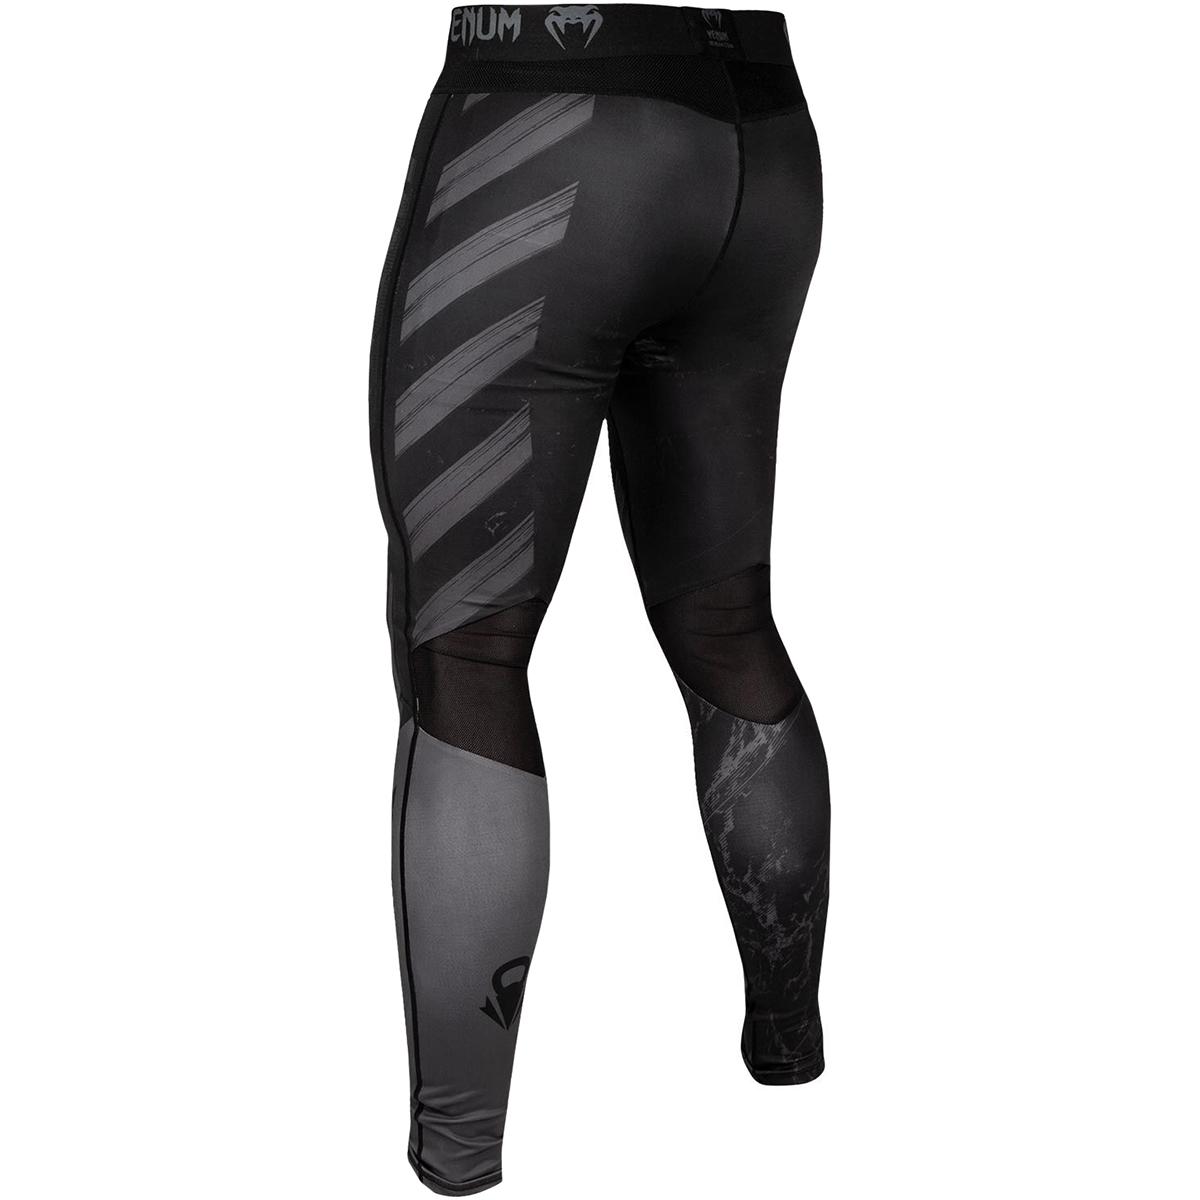 Black//Gray Venum AMRAP Compression Shorts